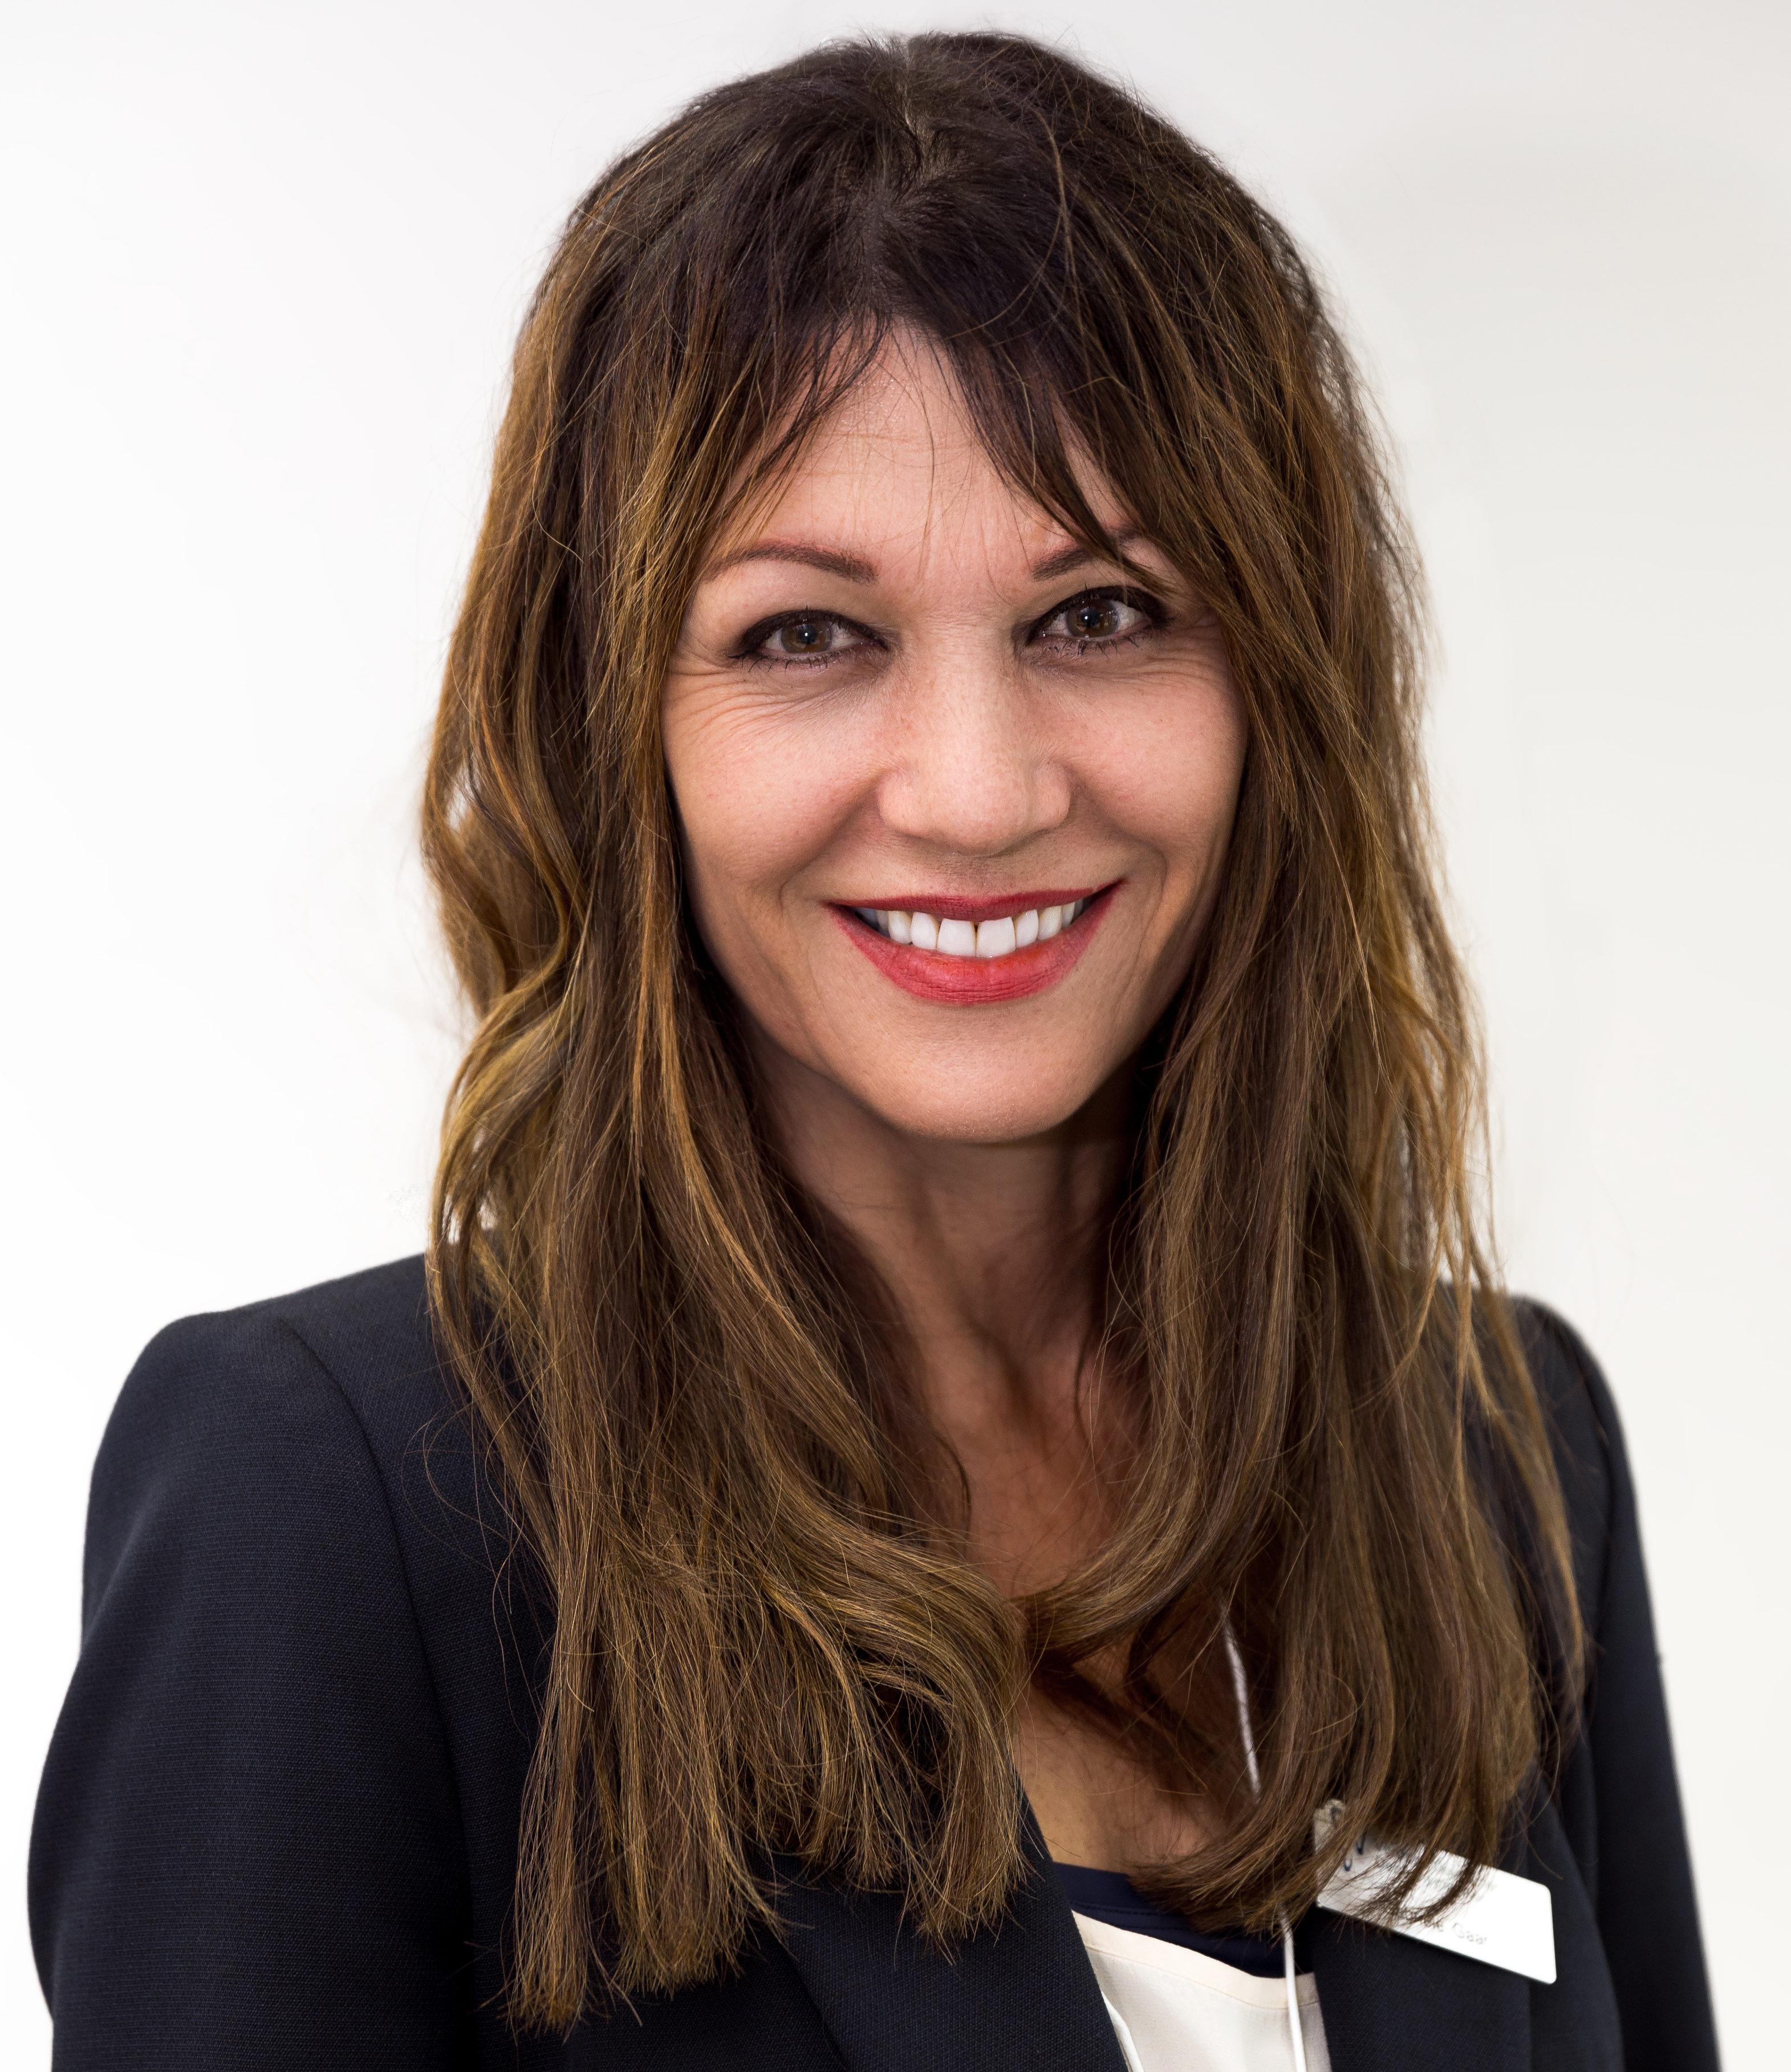 Gabriele Gaar - Dentalhygieniker (DH) - VDDH